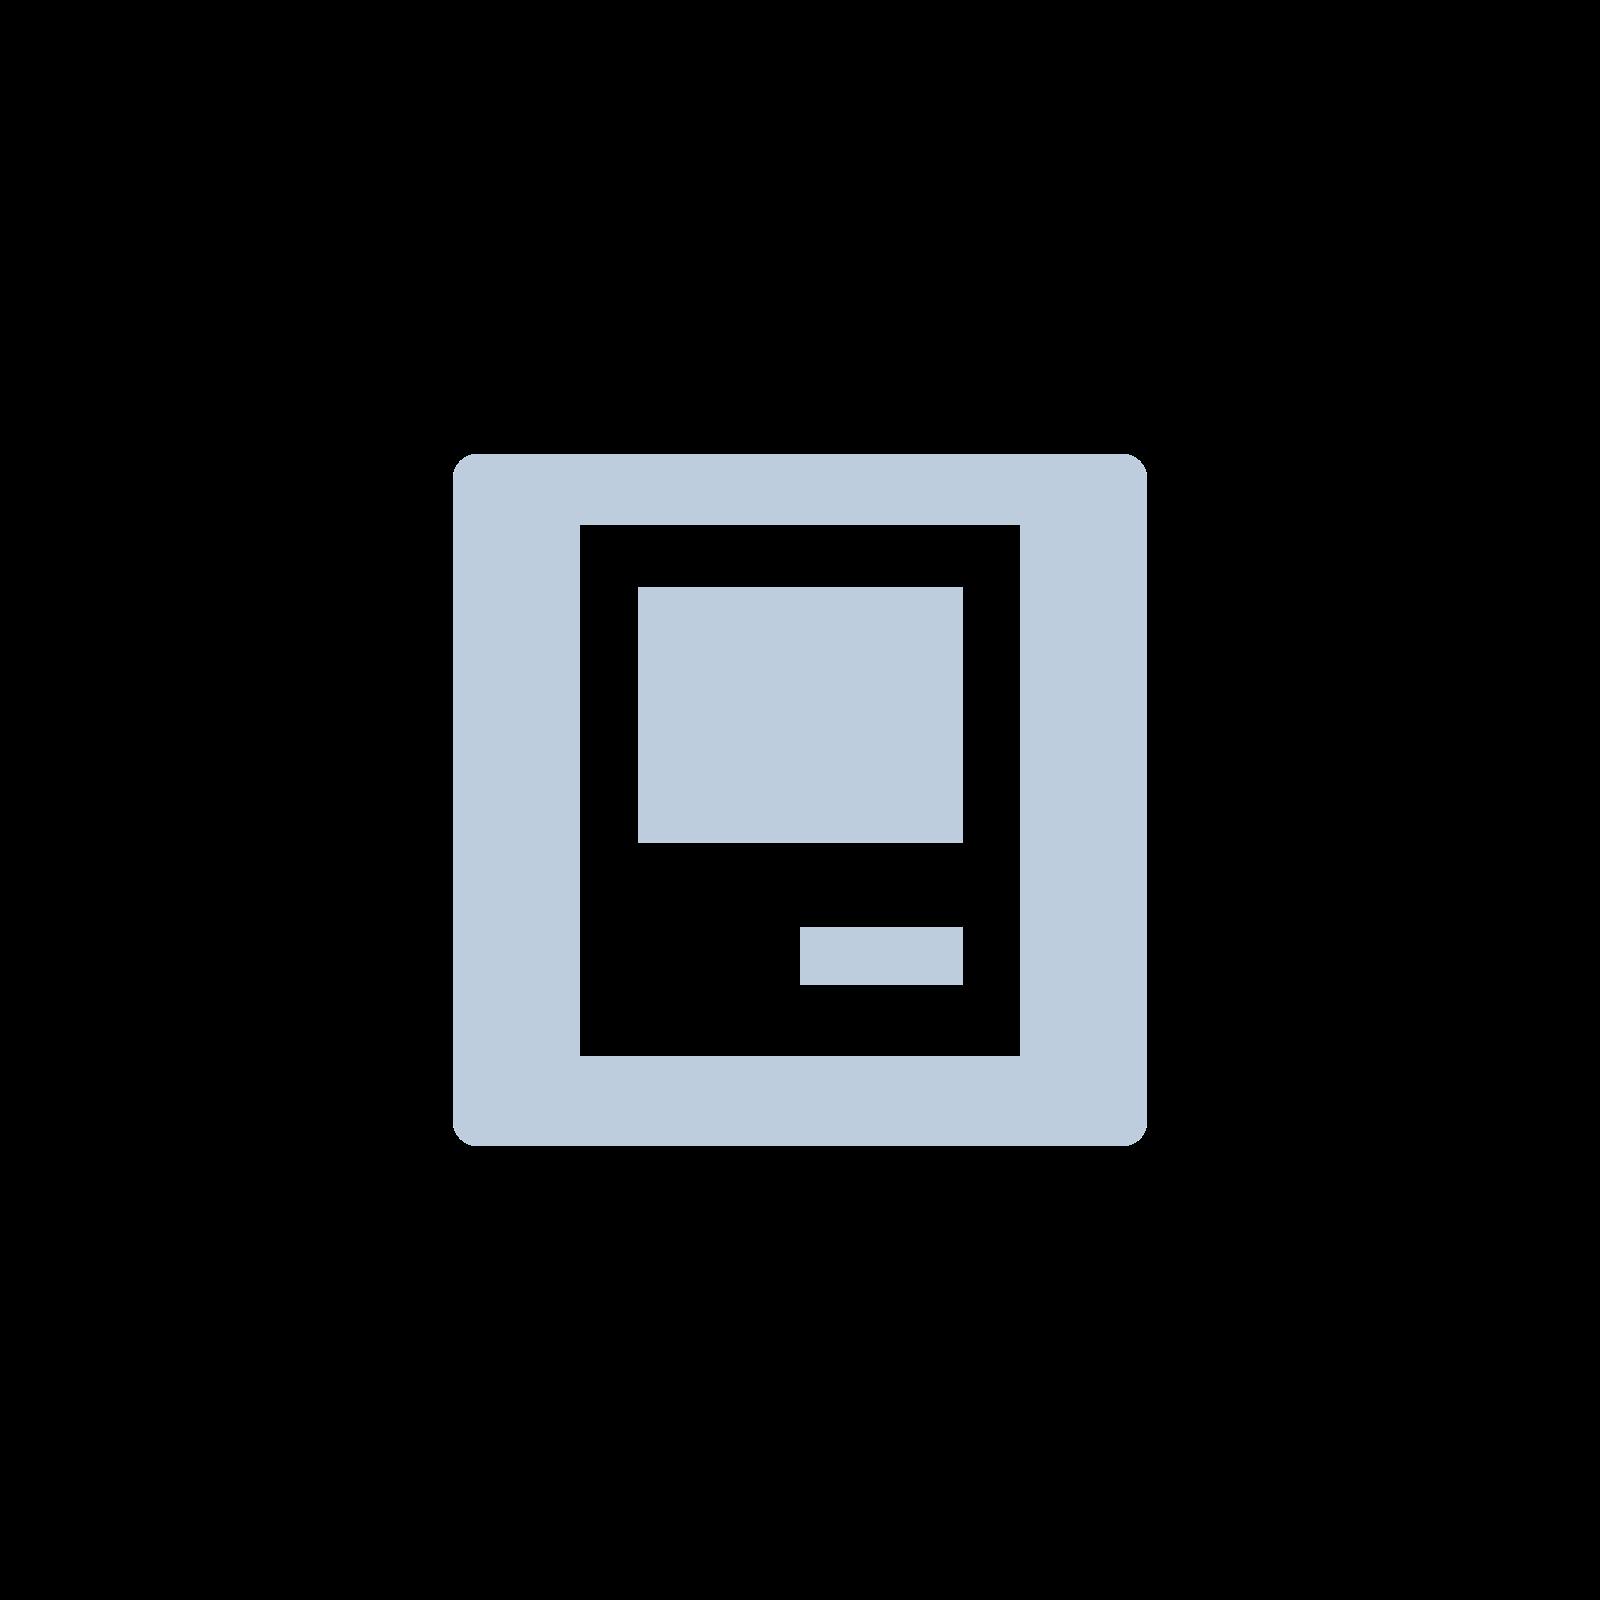 Apple iPad Air (1. Generation) 16GB Wi-Fi Space Grau